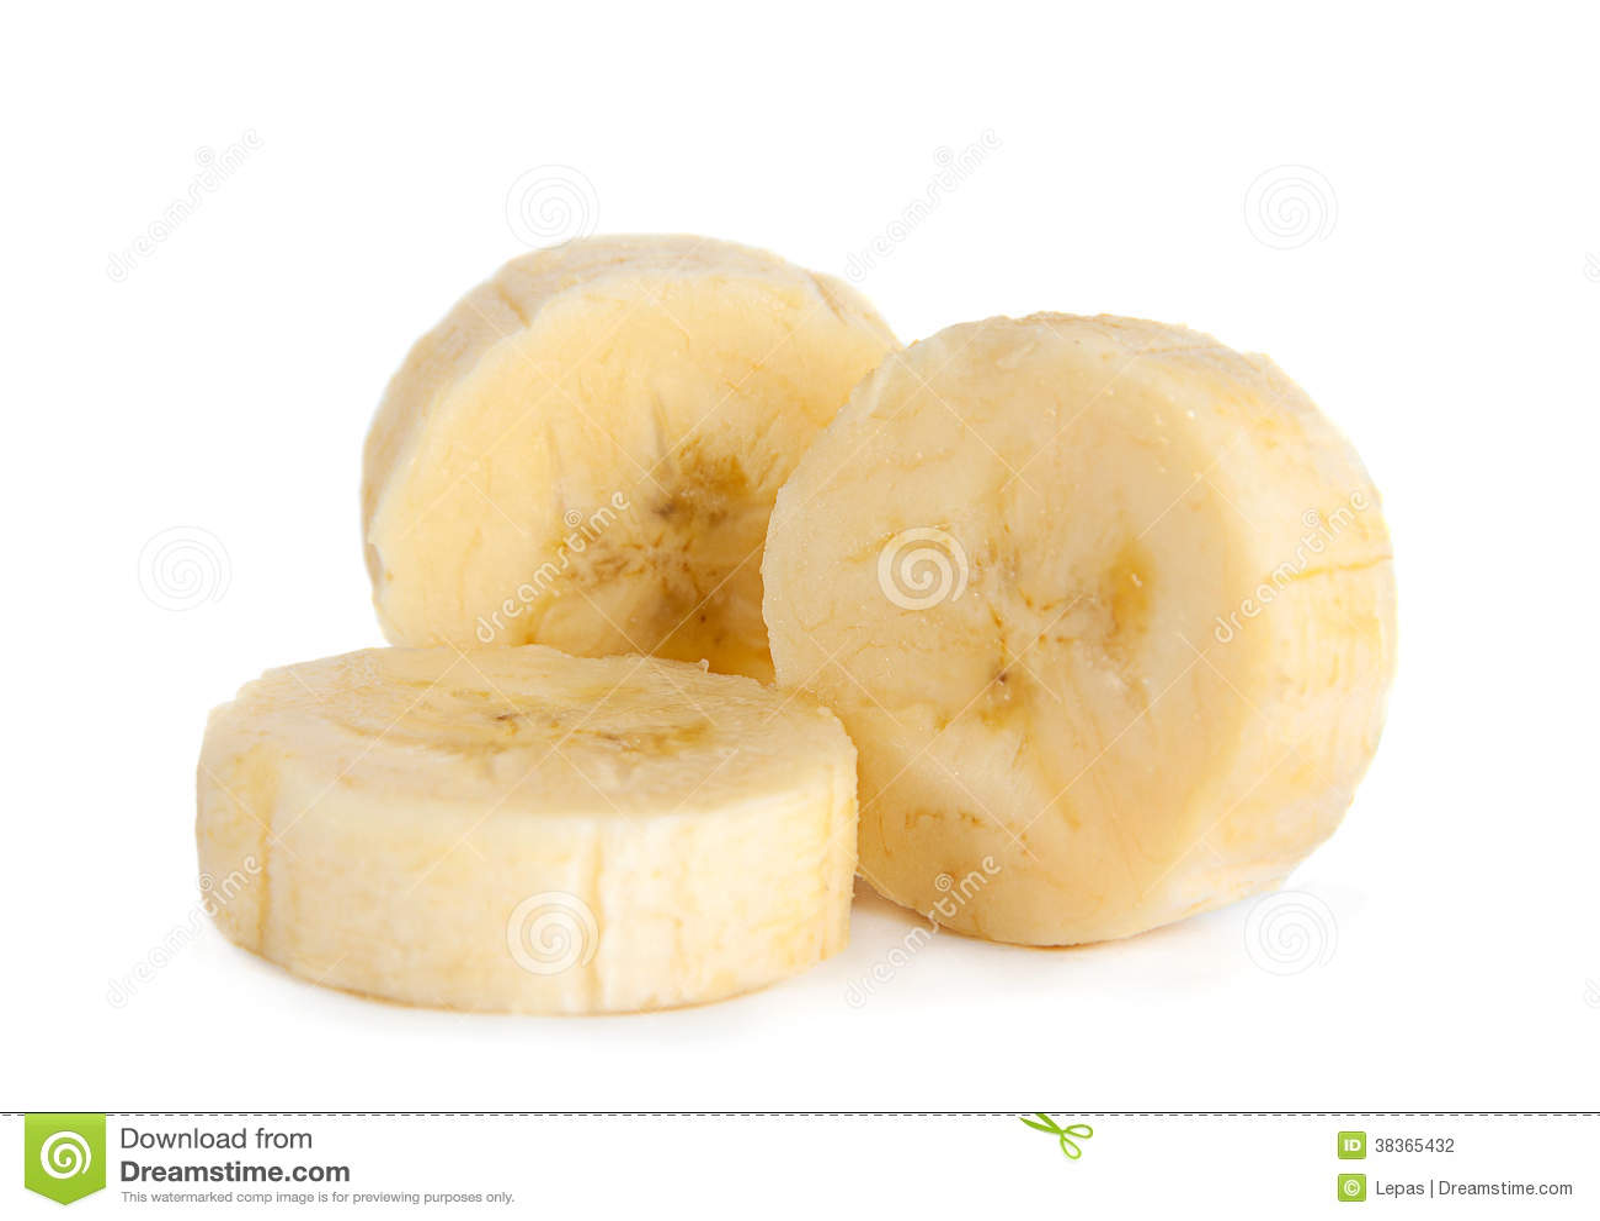 Banana Slice Closeup Stock Photography - Image: 38365432